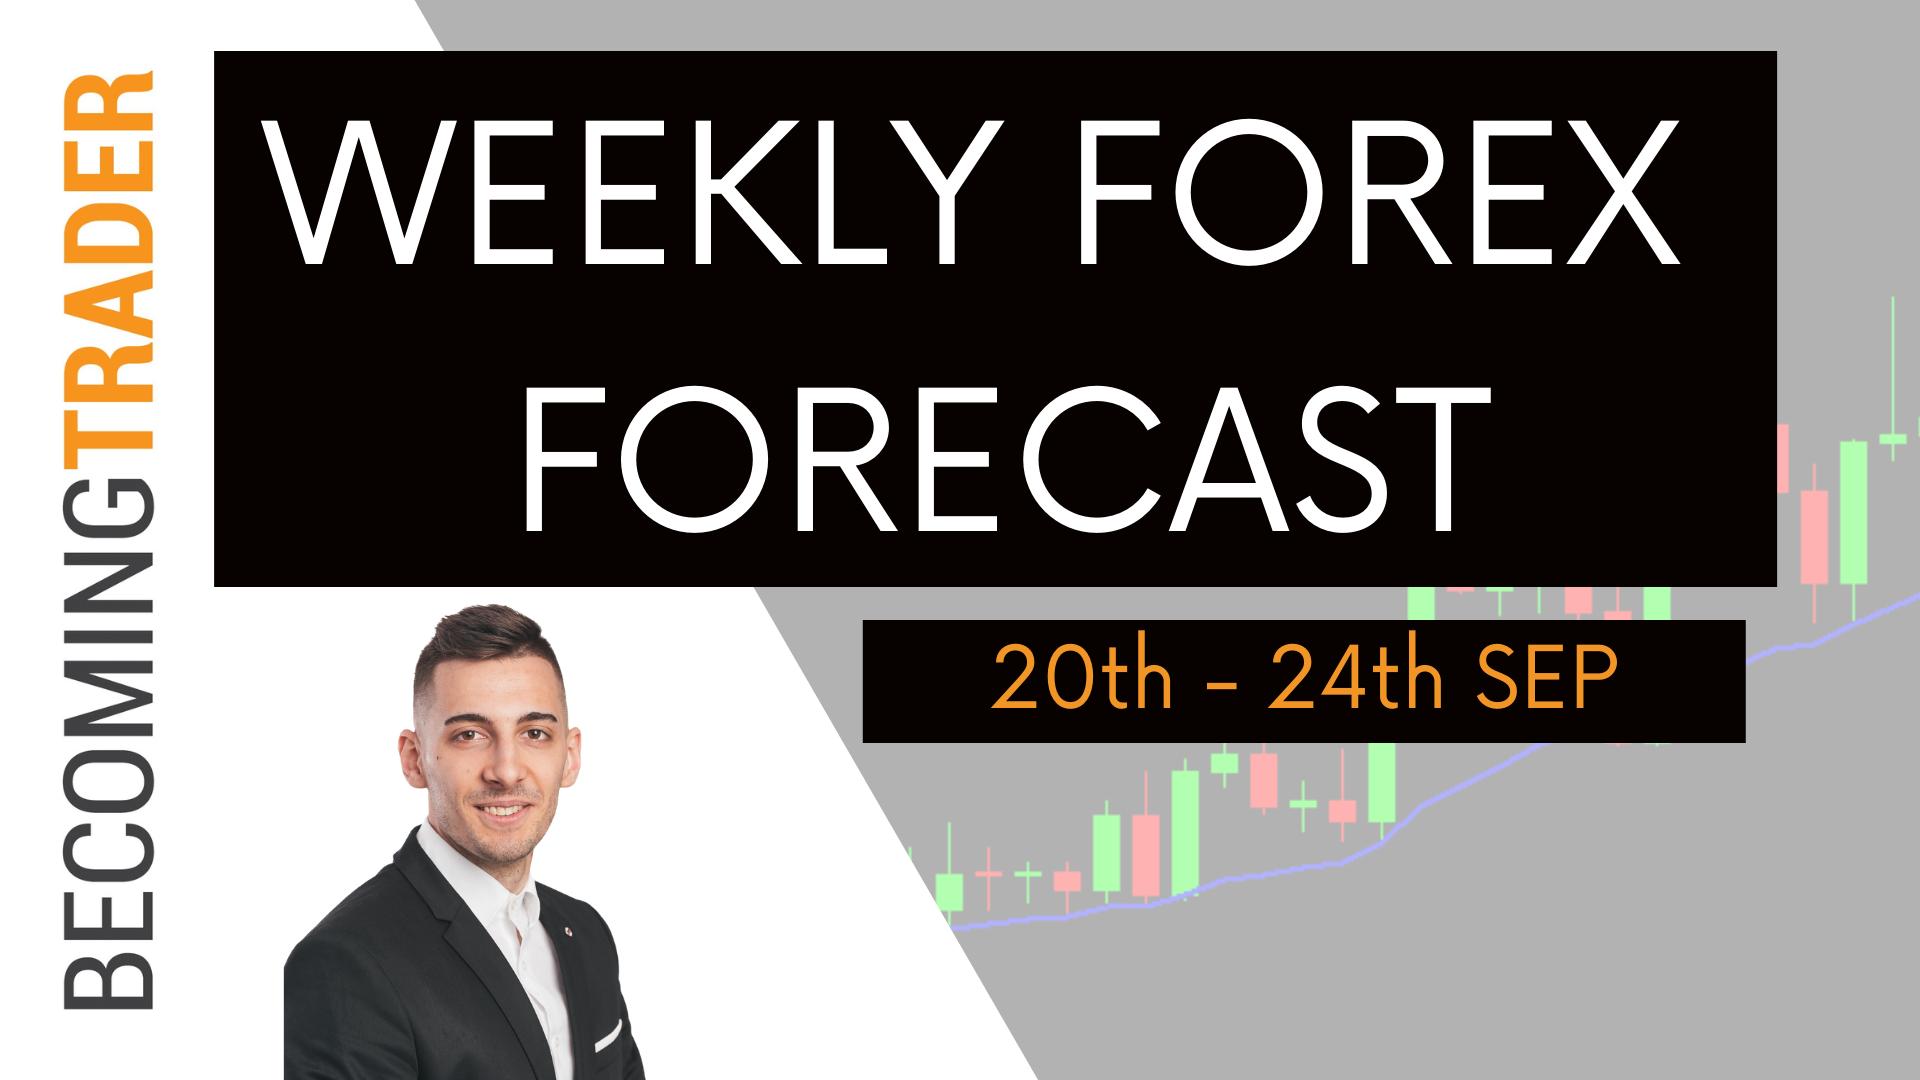 Weekly Forex Forecast 20th to 24th Sep 2021 | EURUSD , GBPUSD , AUDUSD , NZDUSD , USDCAD , USDJPY